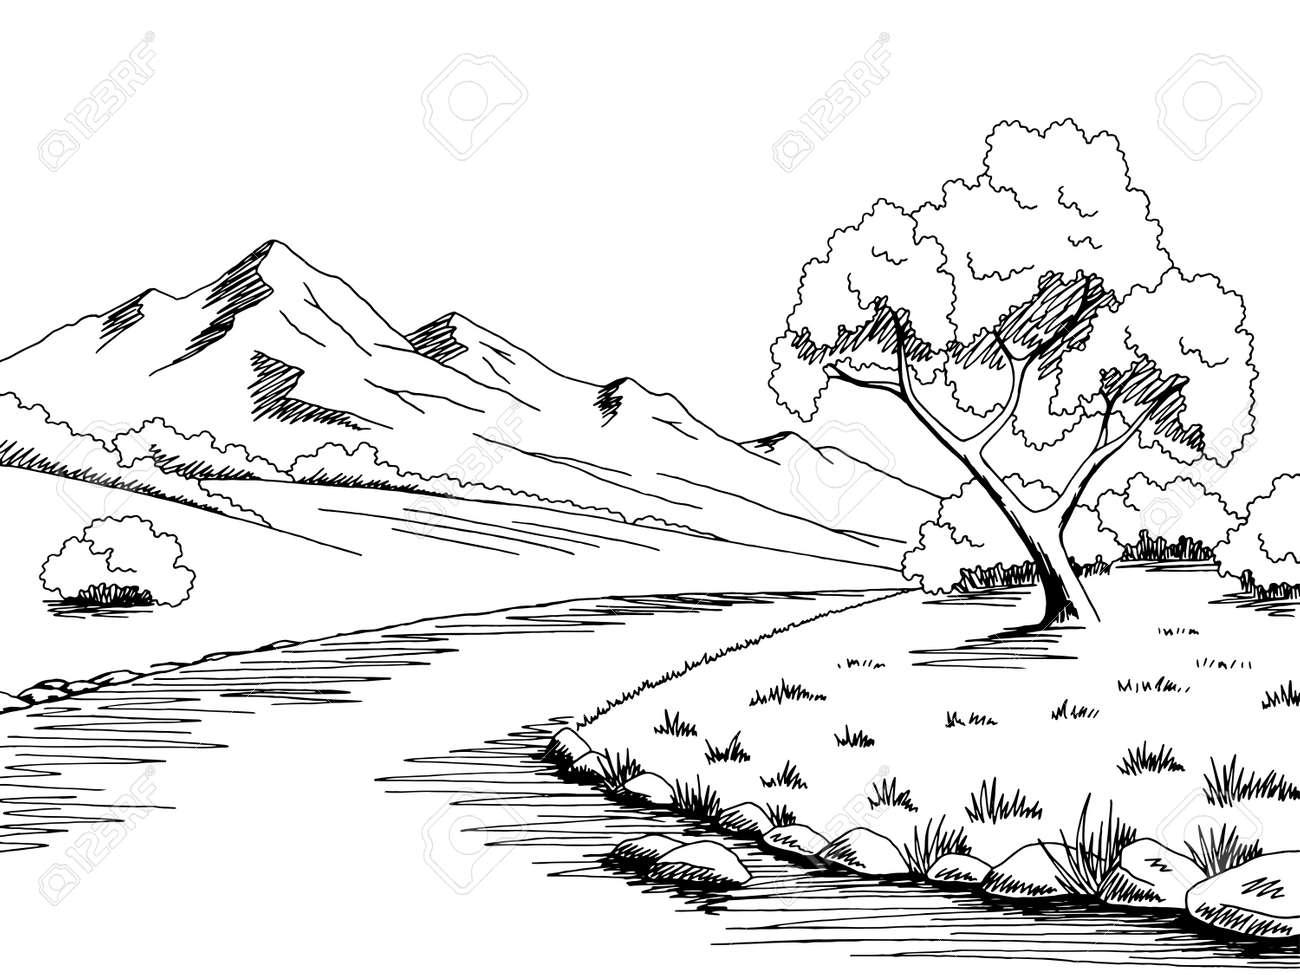 Mountain Landscape Black and White Clip Art